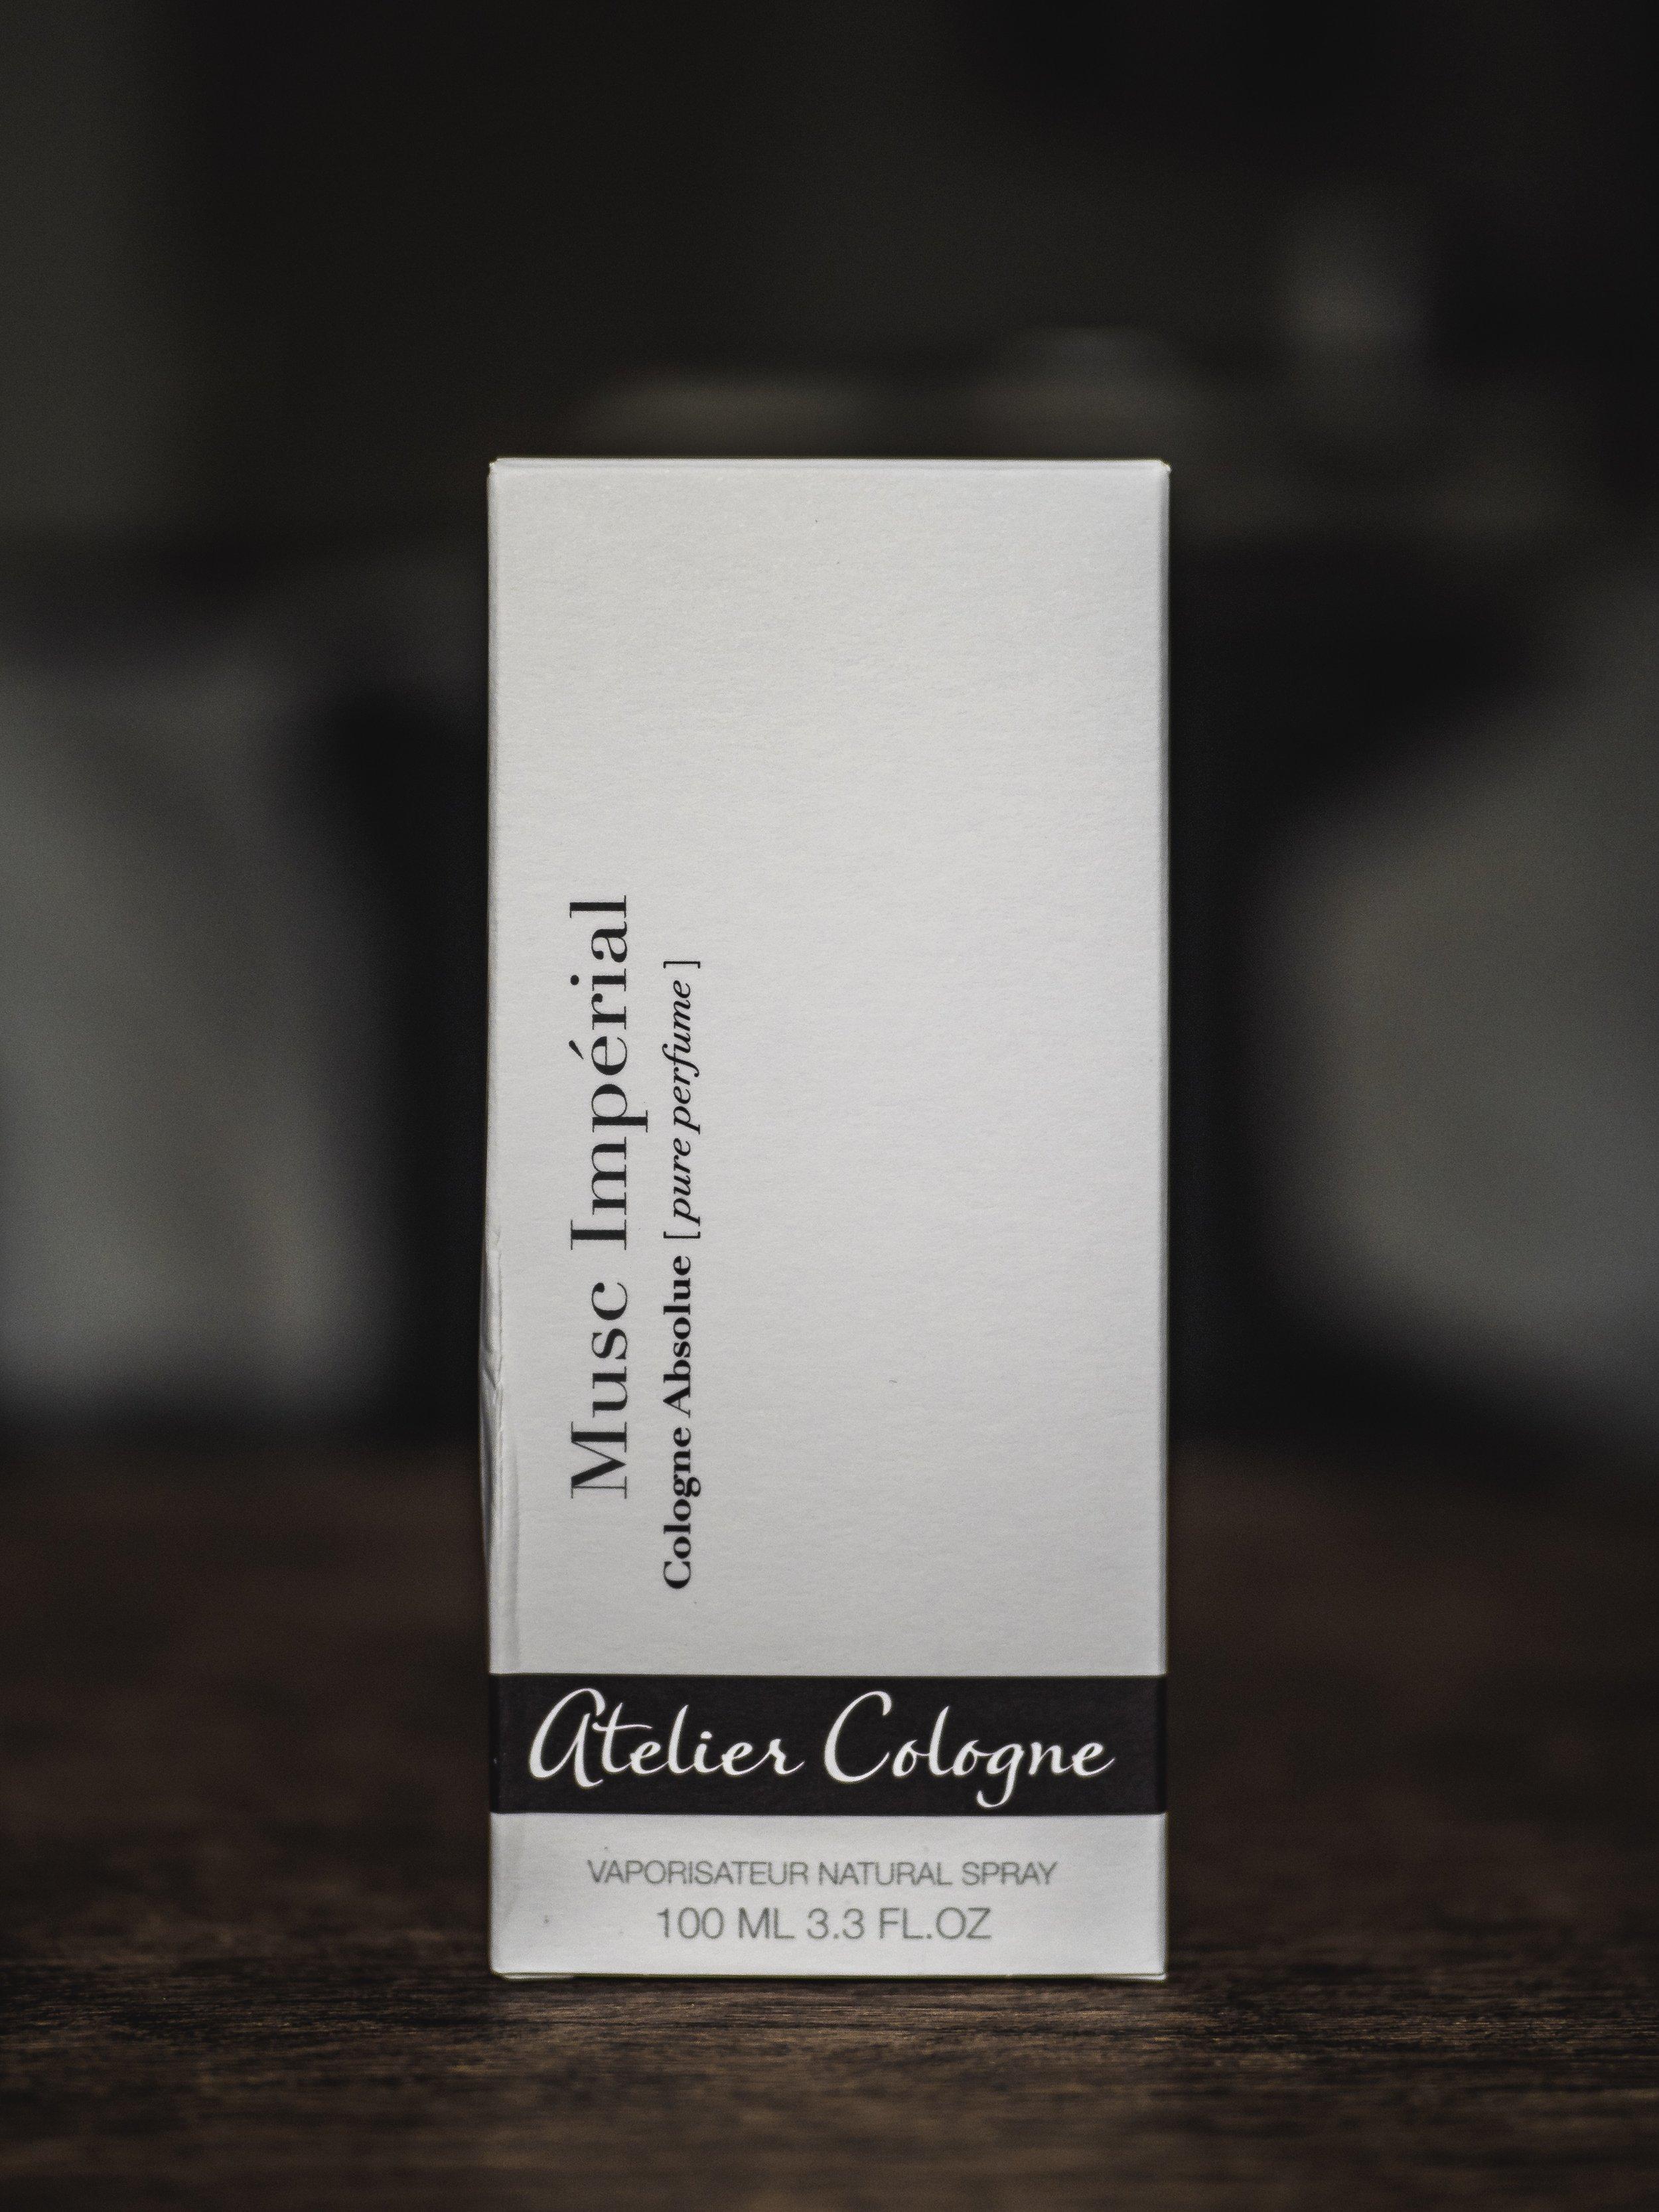 Atelier Cologne Musc Impérial Fragrance Review